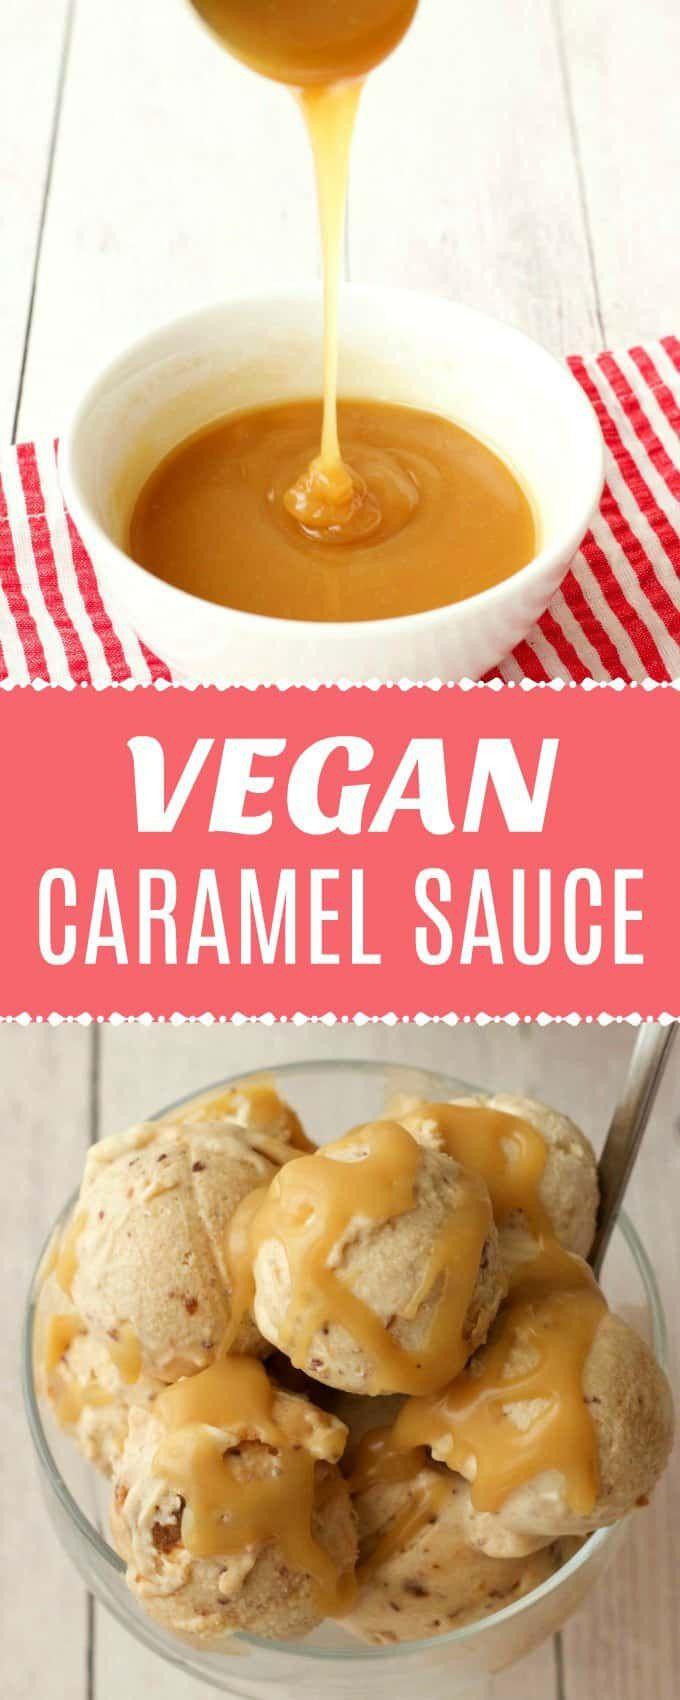 Fabulous 3 Ingredient Vegan Caramel Sauce This Sauce Is Perfect